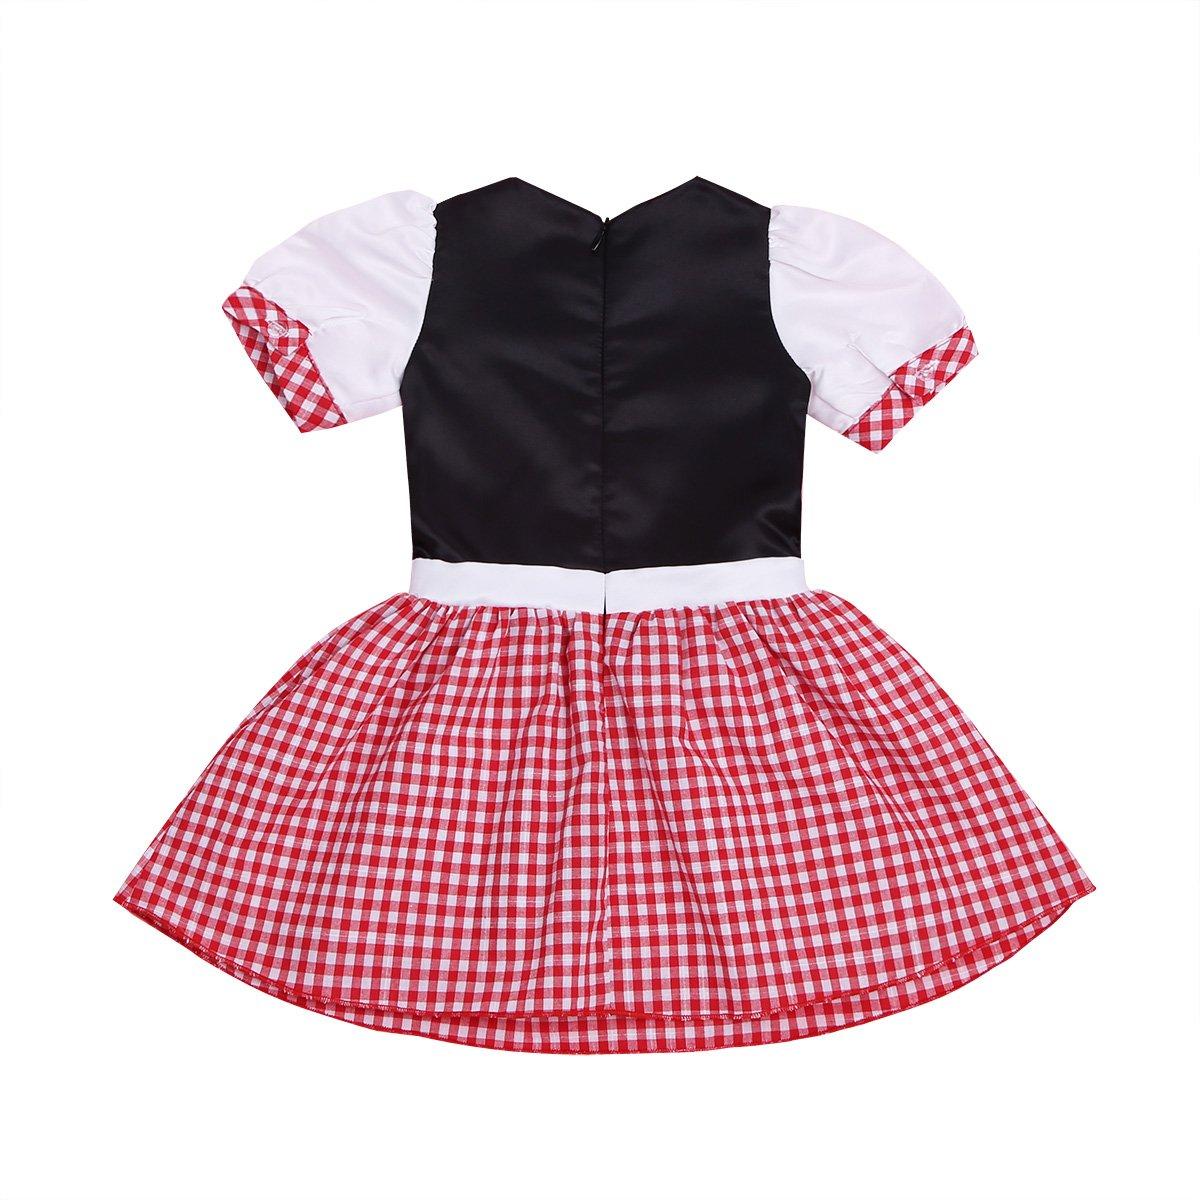 iiniim Baby Girls Halloween Party Costumes Short Sleeves Dress with Hooded Cloak (18-24 Months) by iiniim (Image #5)